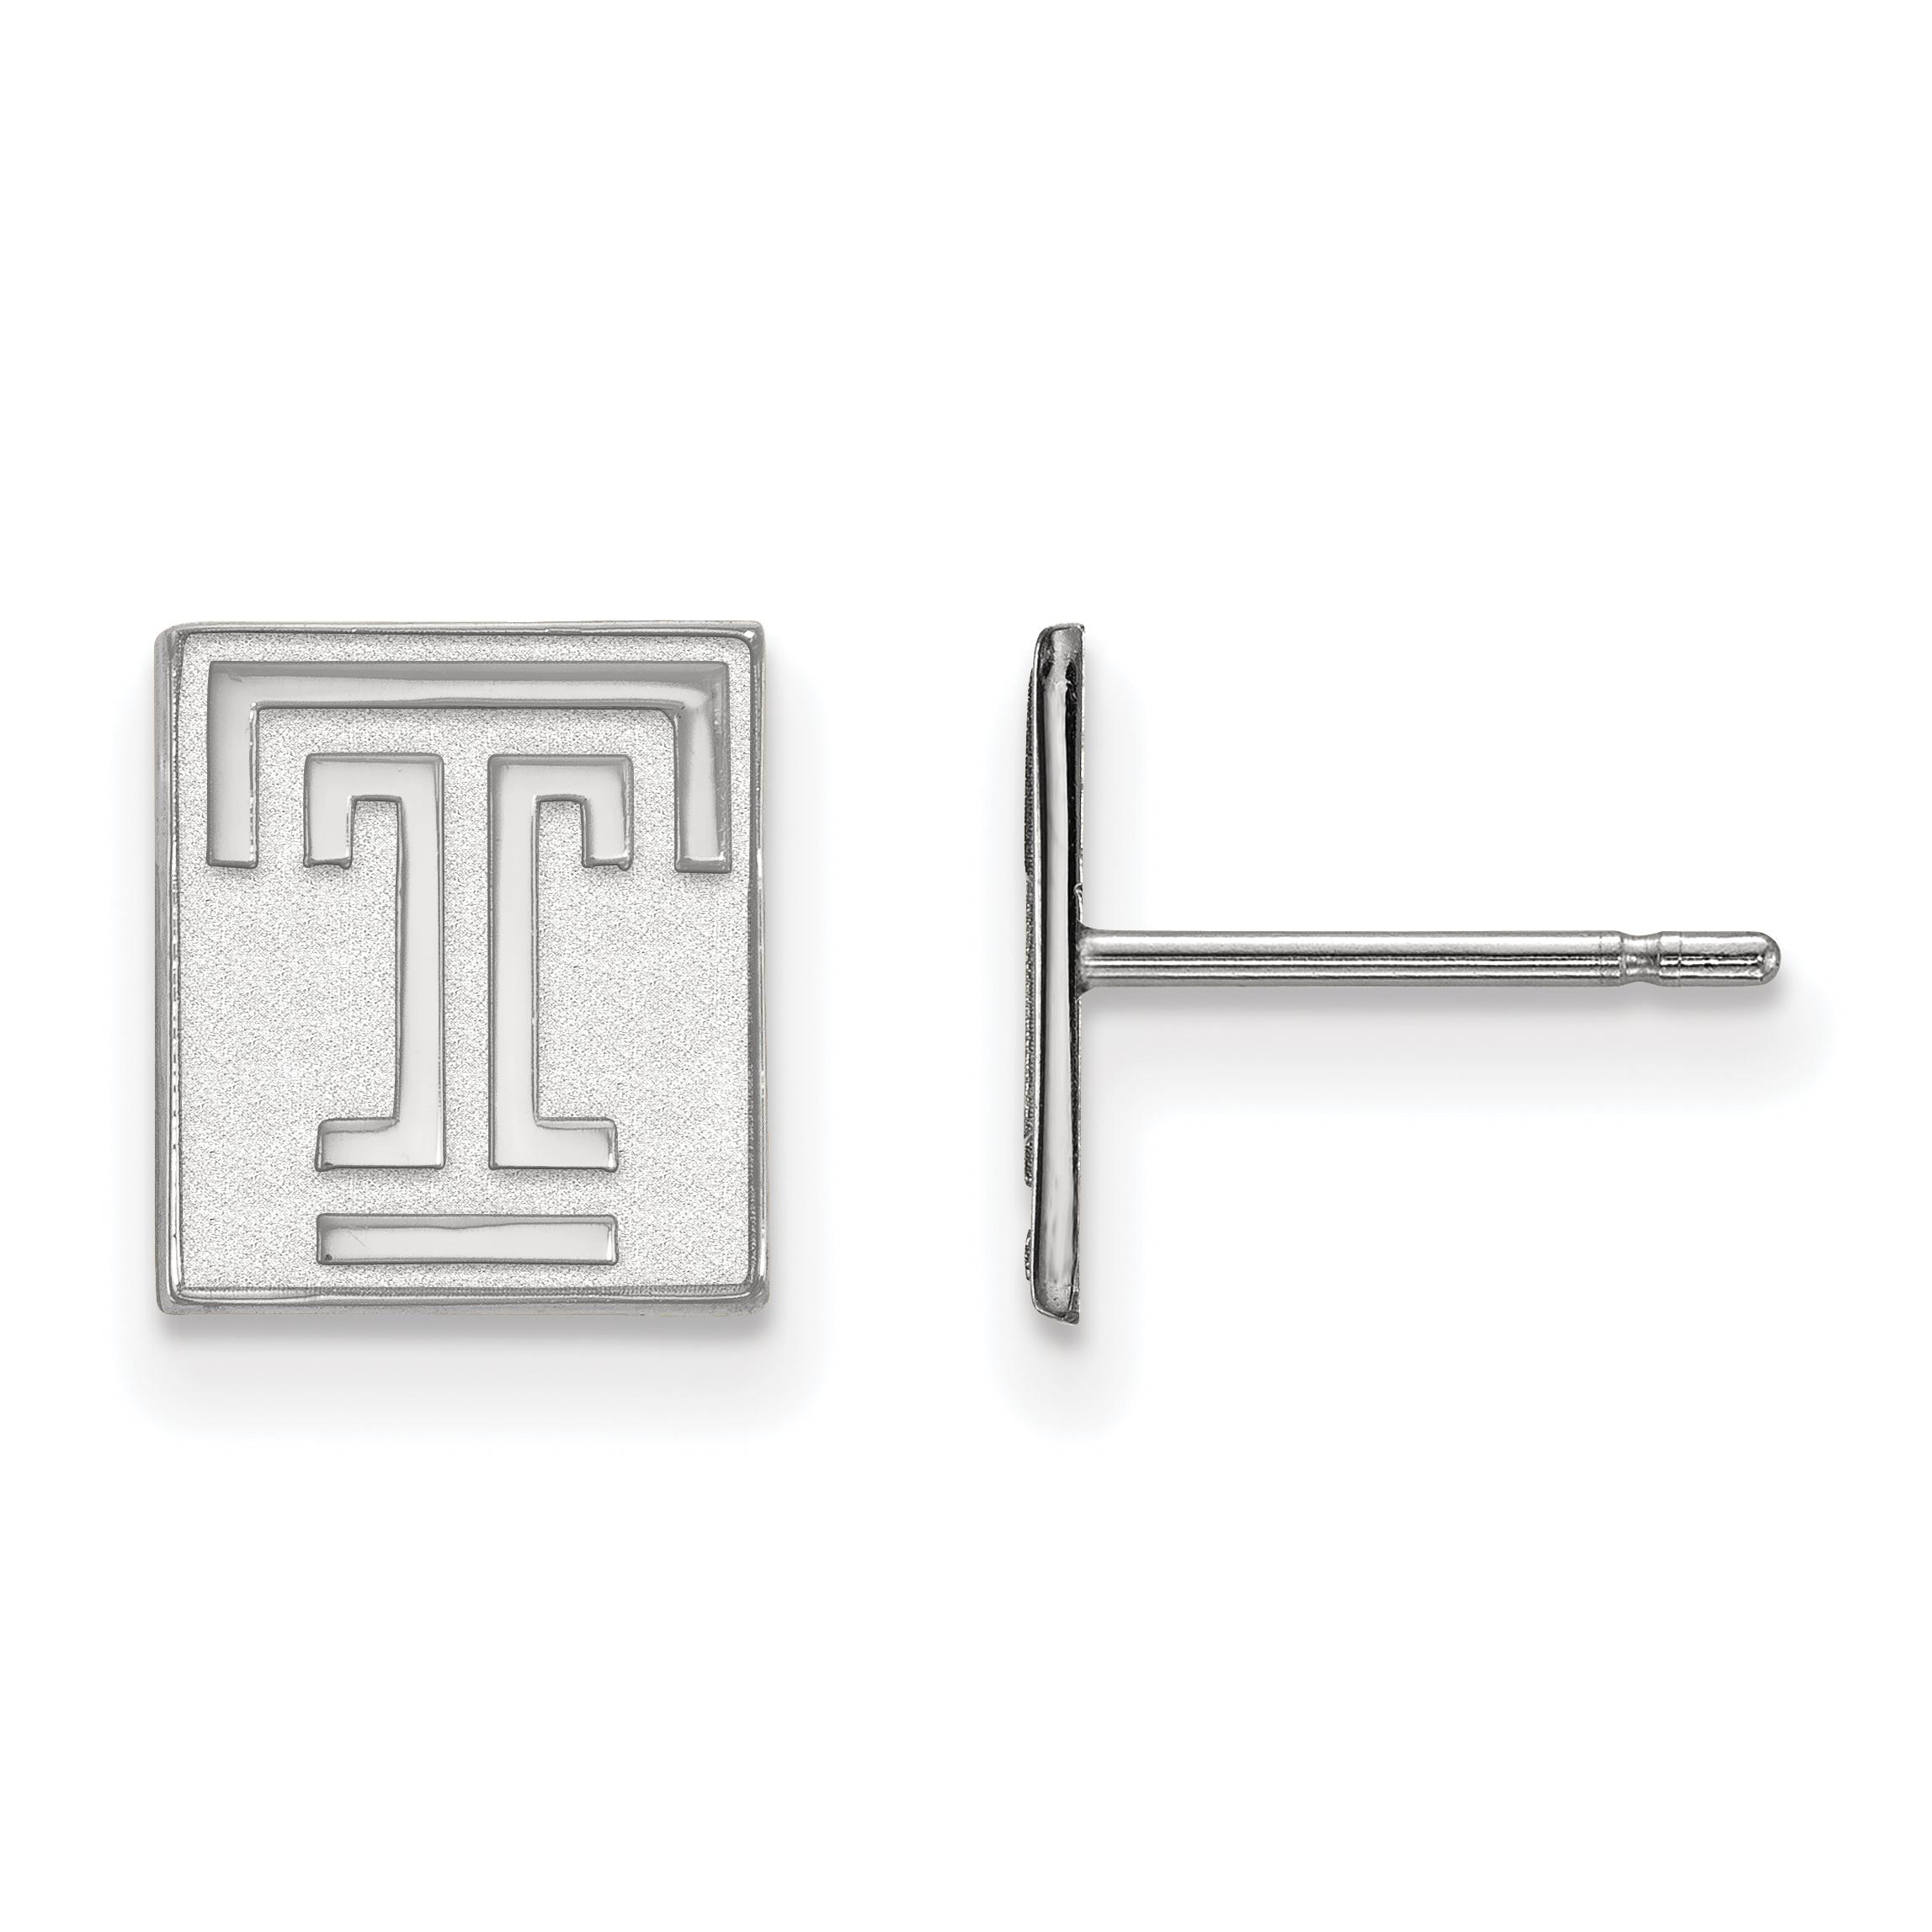 10kw Temple University XS Post Earrings. weight: 1.19, Lengh: 9mm